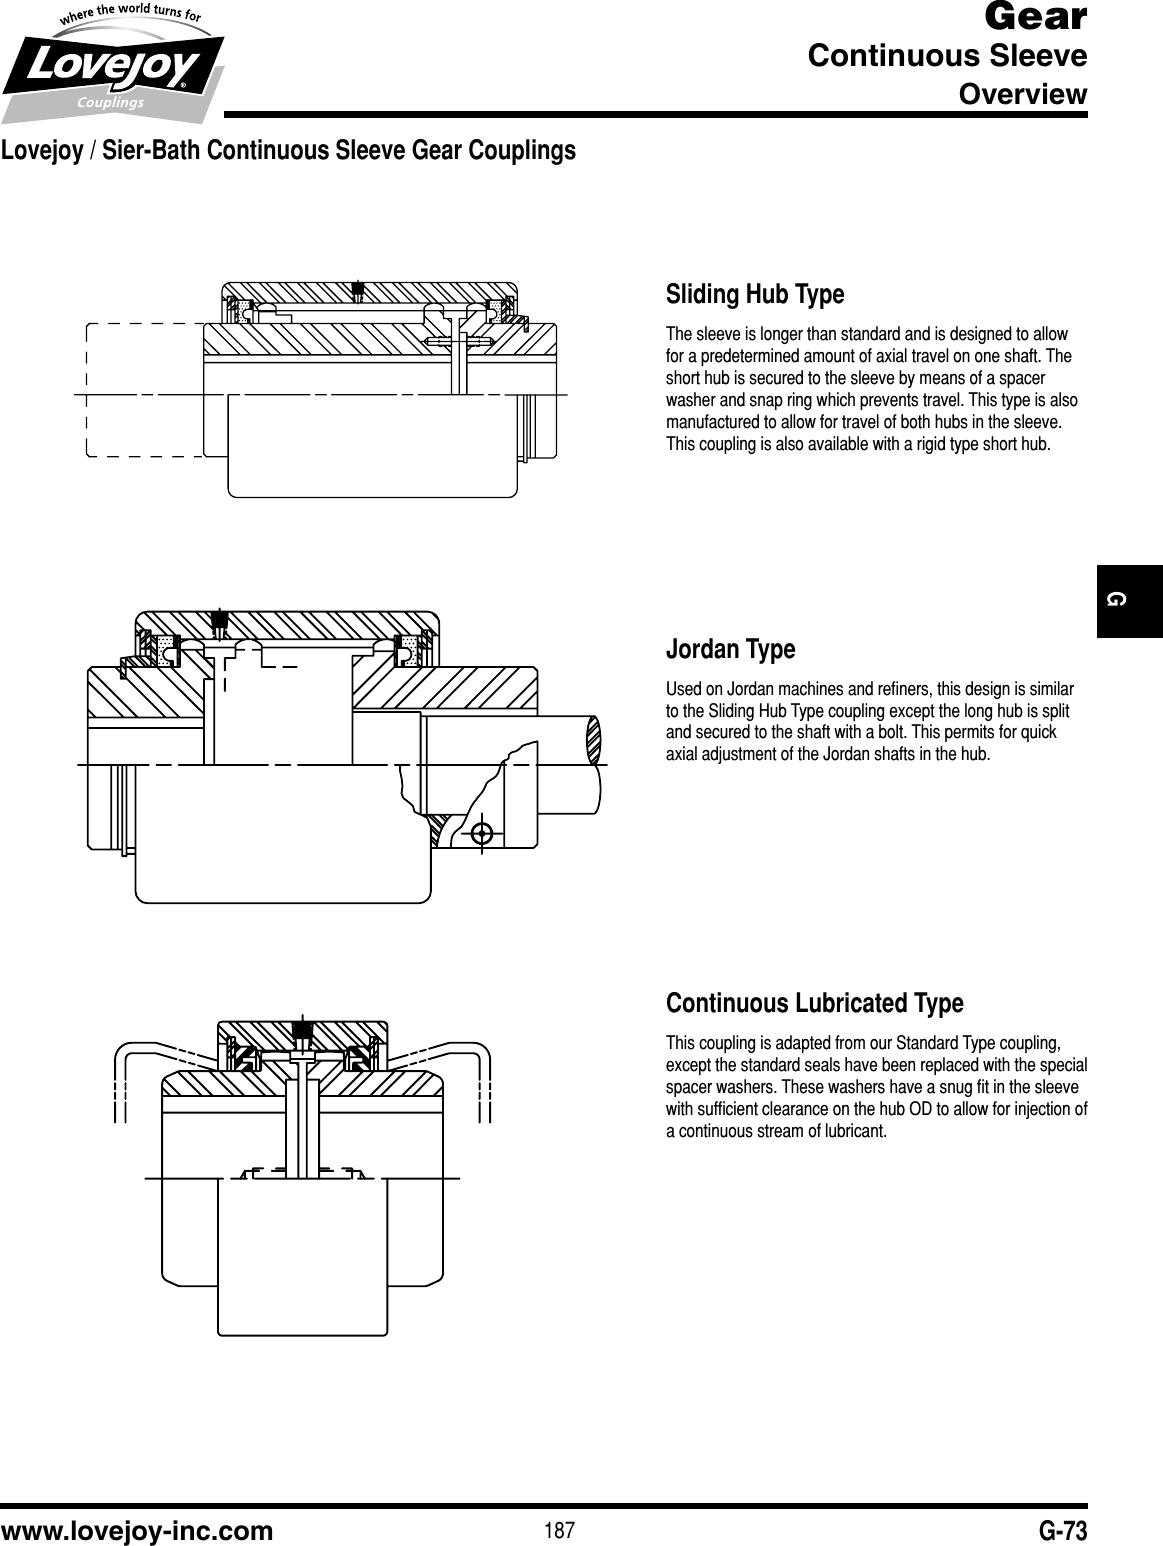 Gear Couplings Catalog